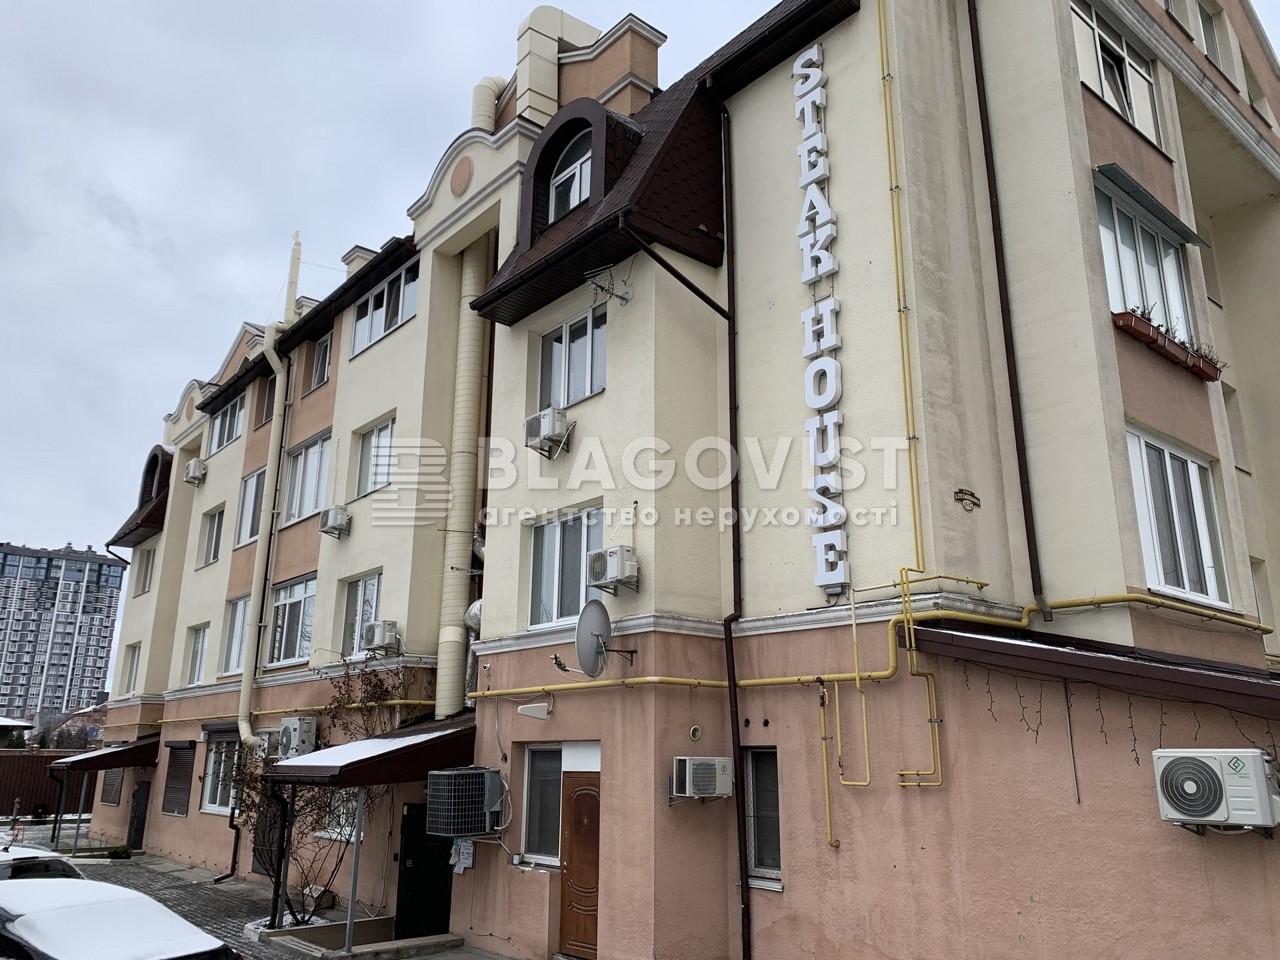 Квартира F-44641, Хмельницкого Б. бульв., 15-17, Буча (город) - Фото 2